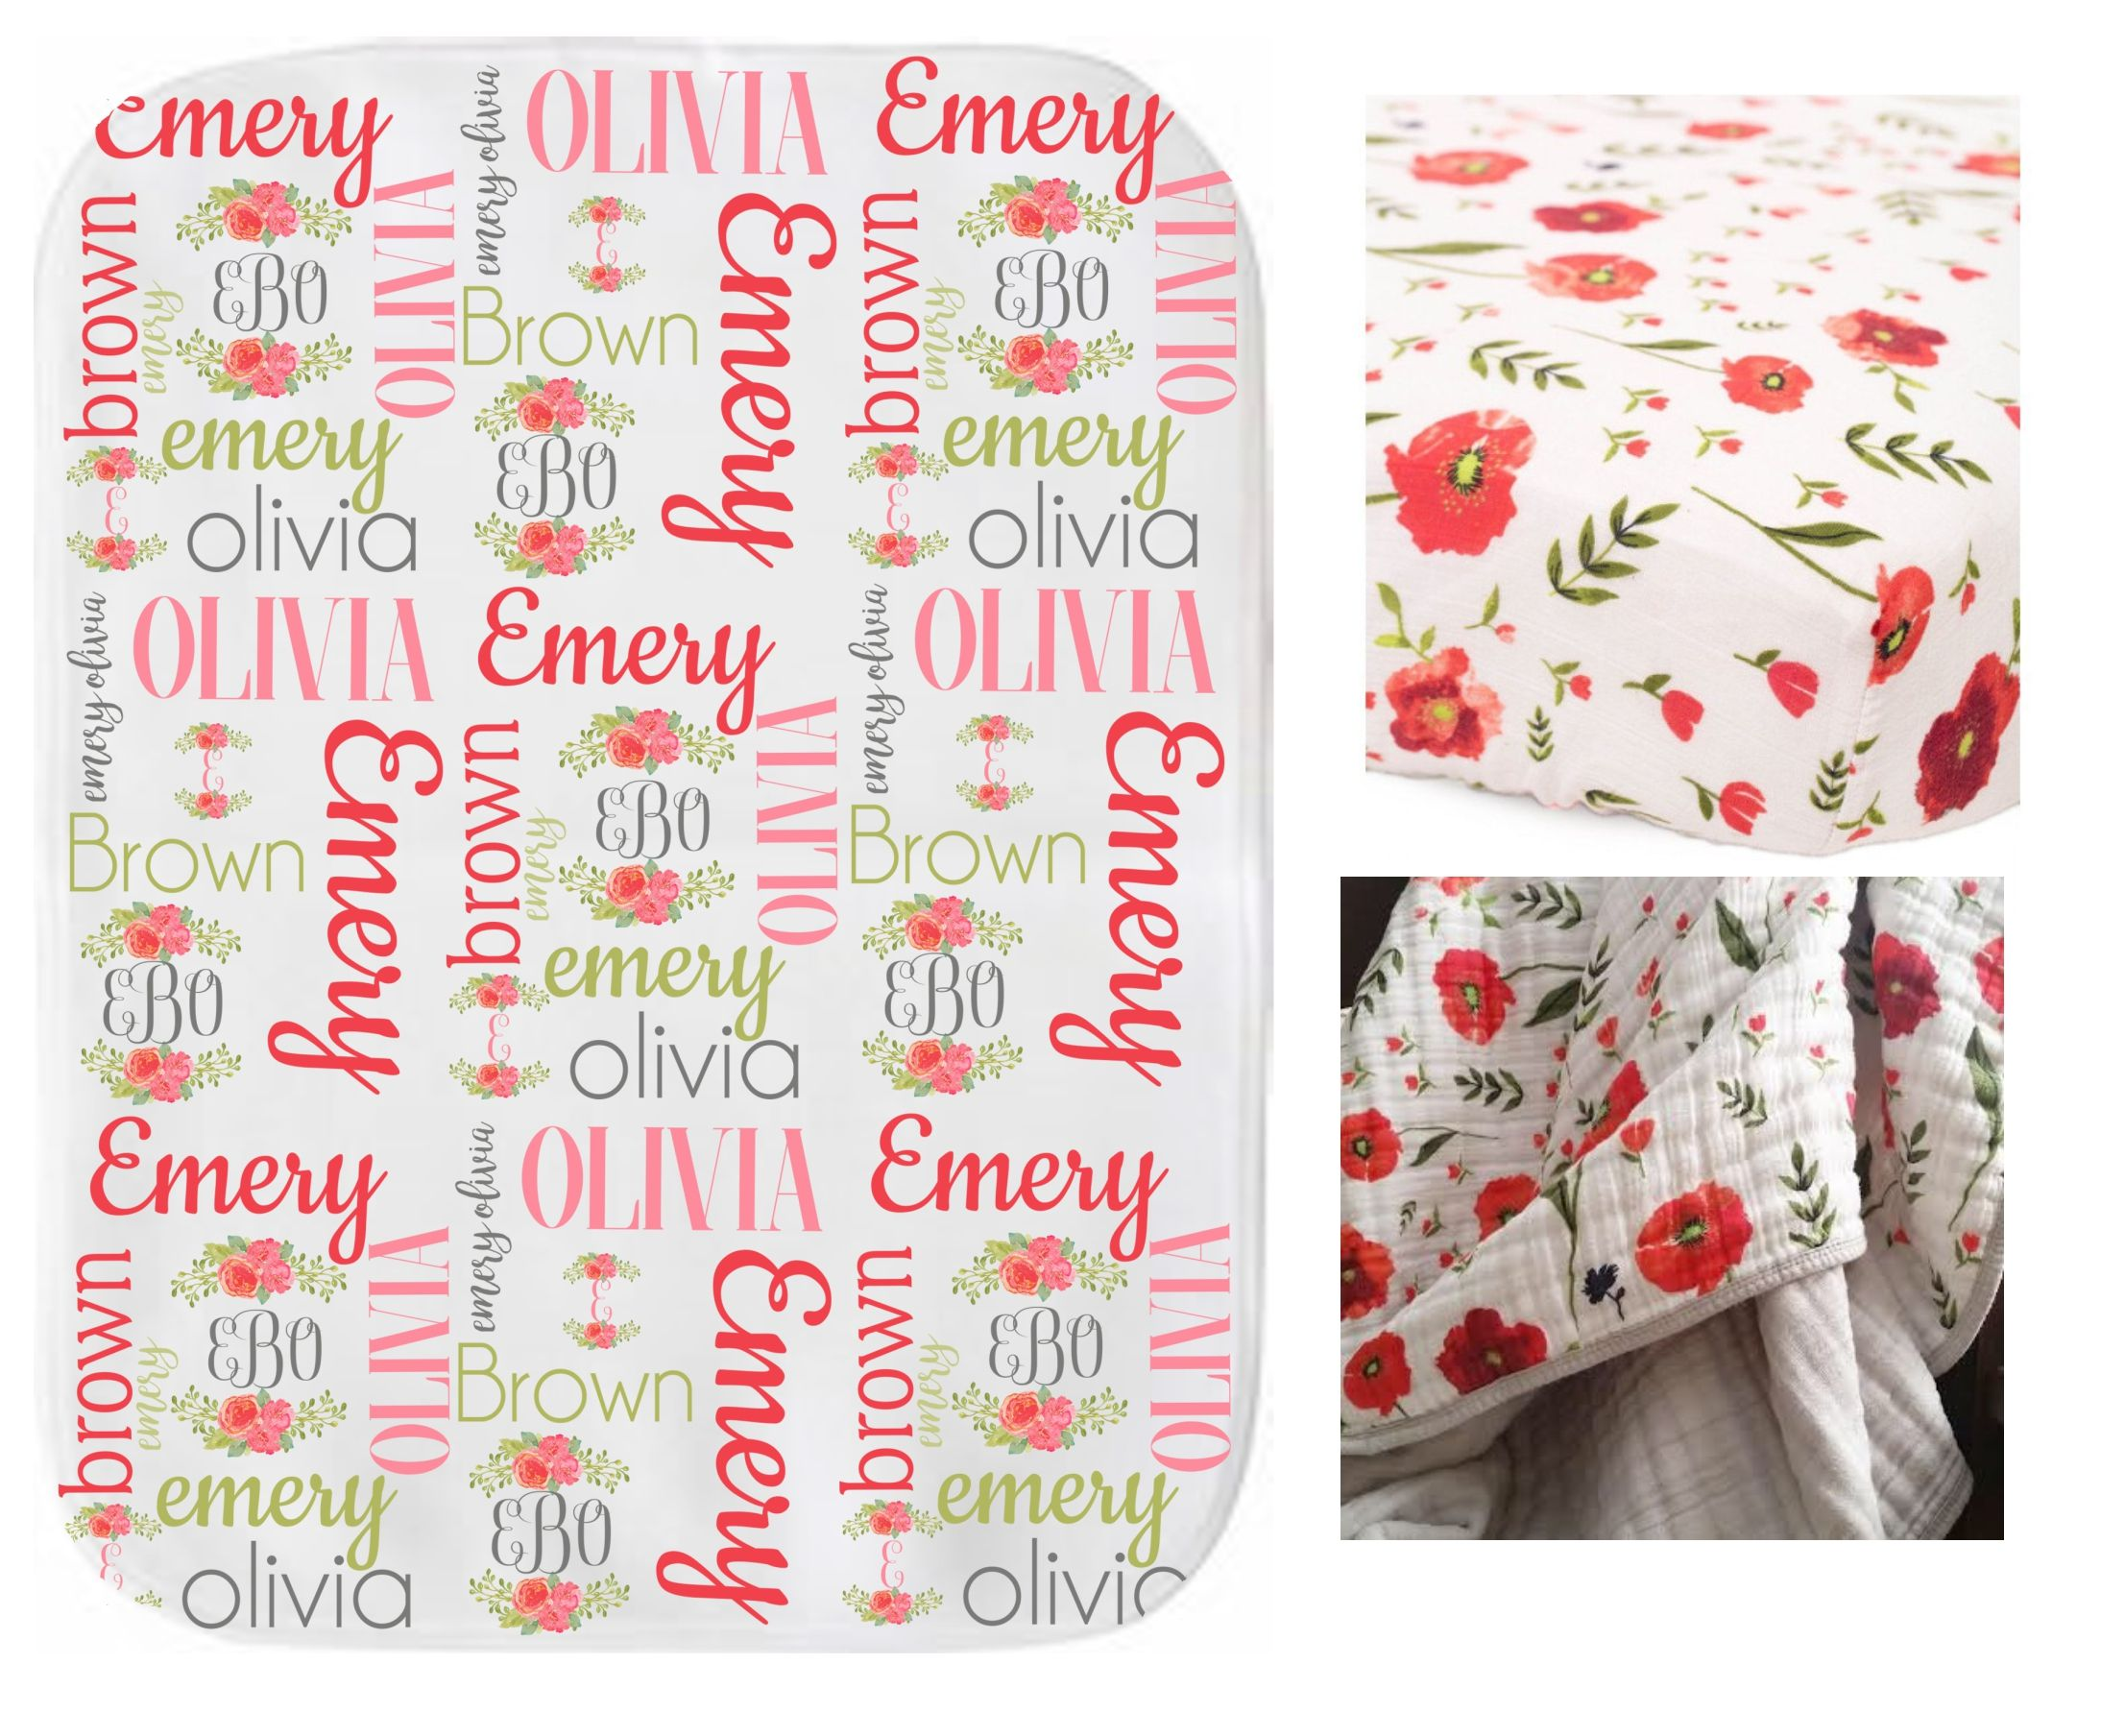 Make A Custom Blanket.Custom Blanket For Sweet Olivia Mom Sent Sheets We Made